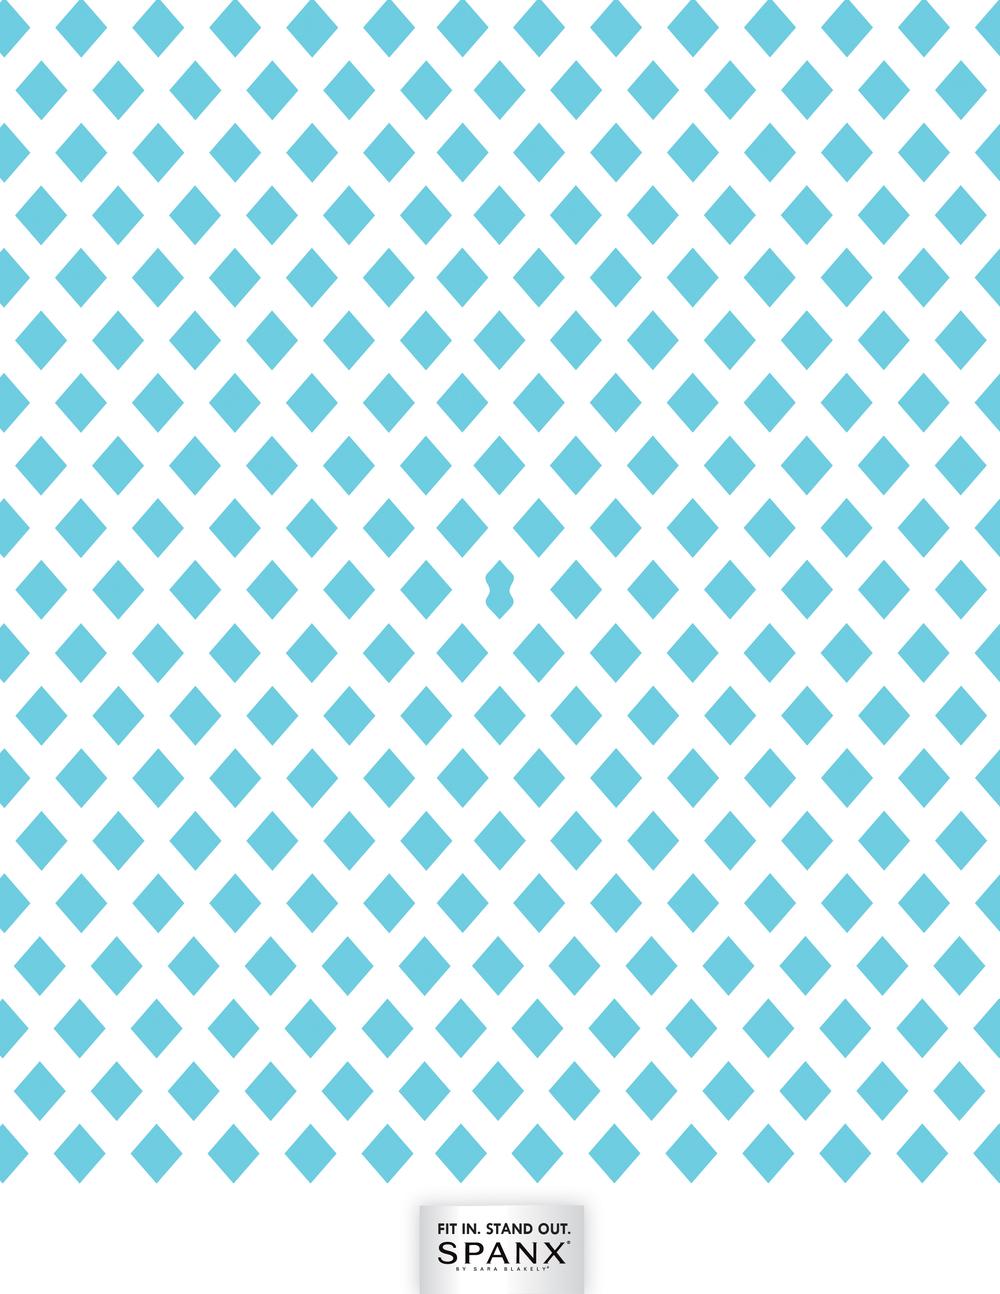 Spanx_Spring2014-02.jpg